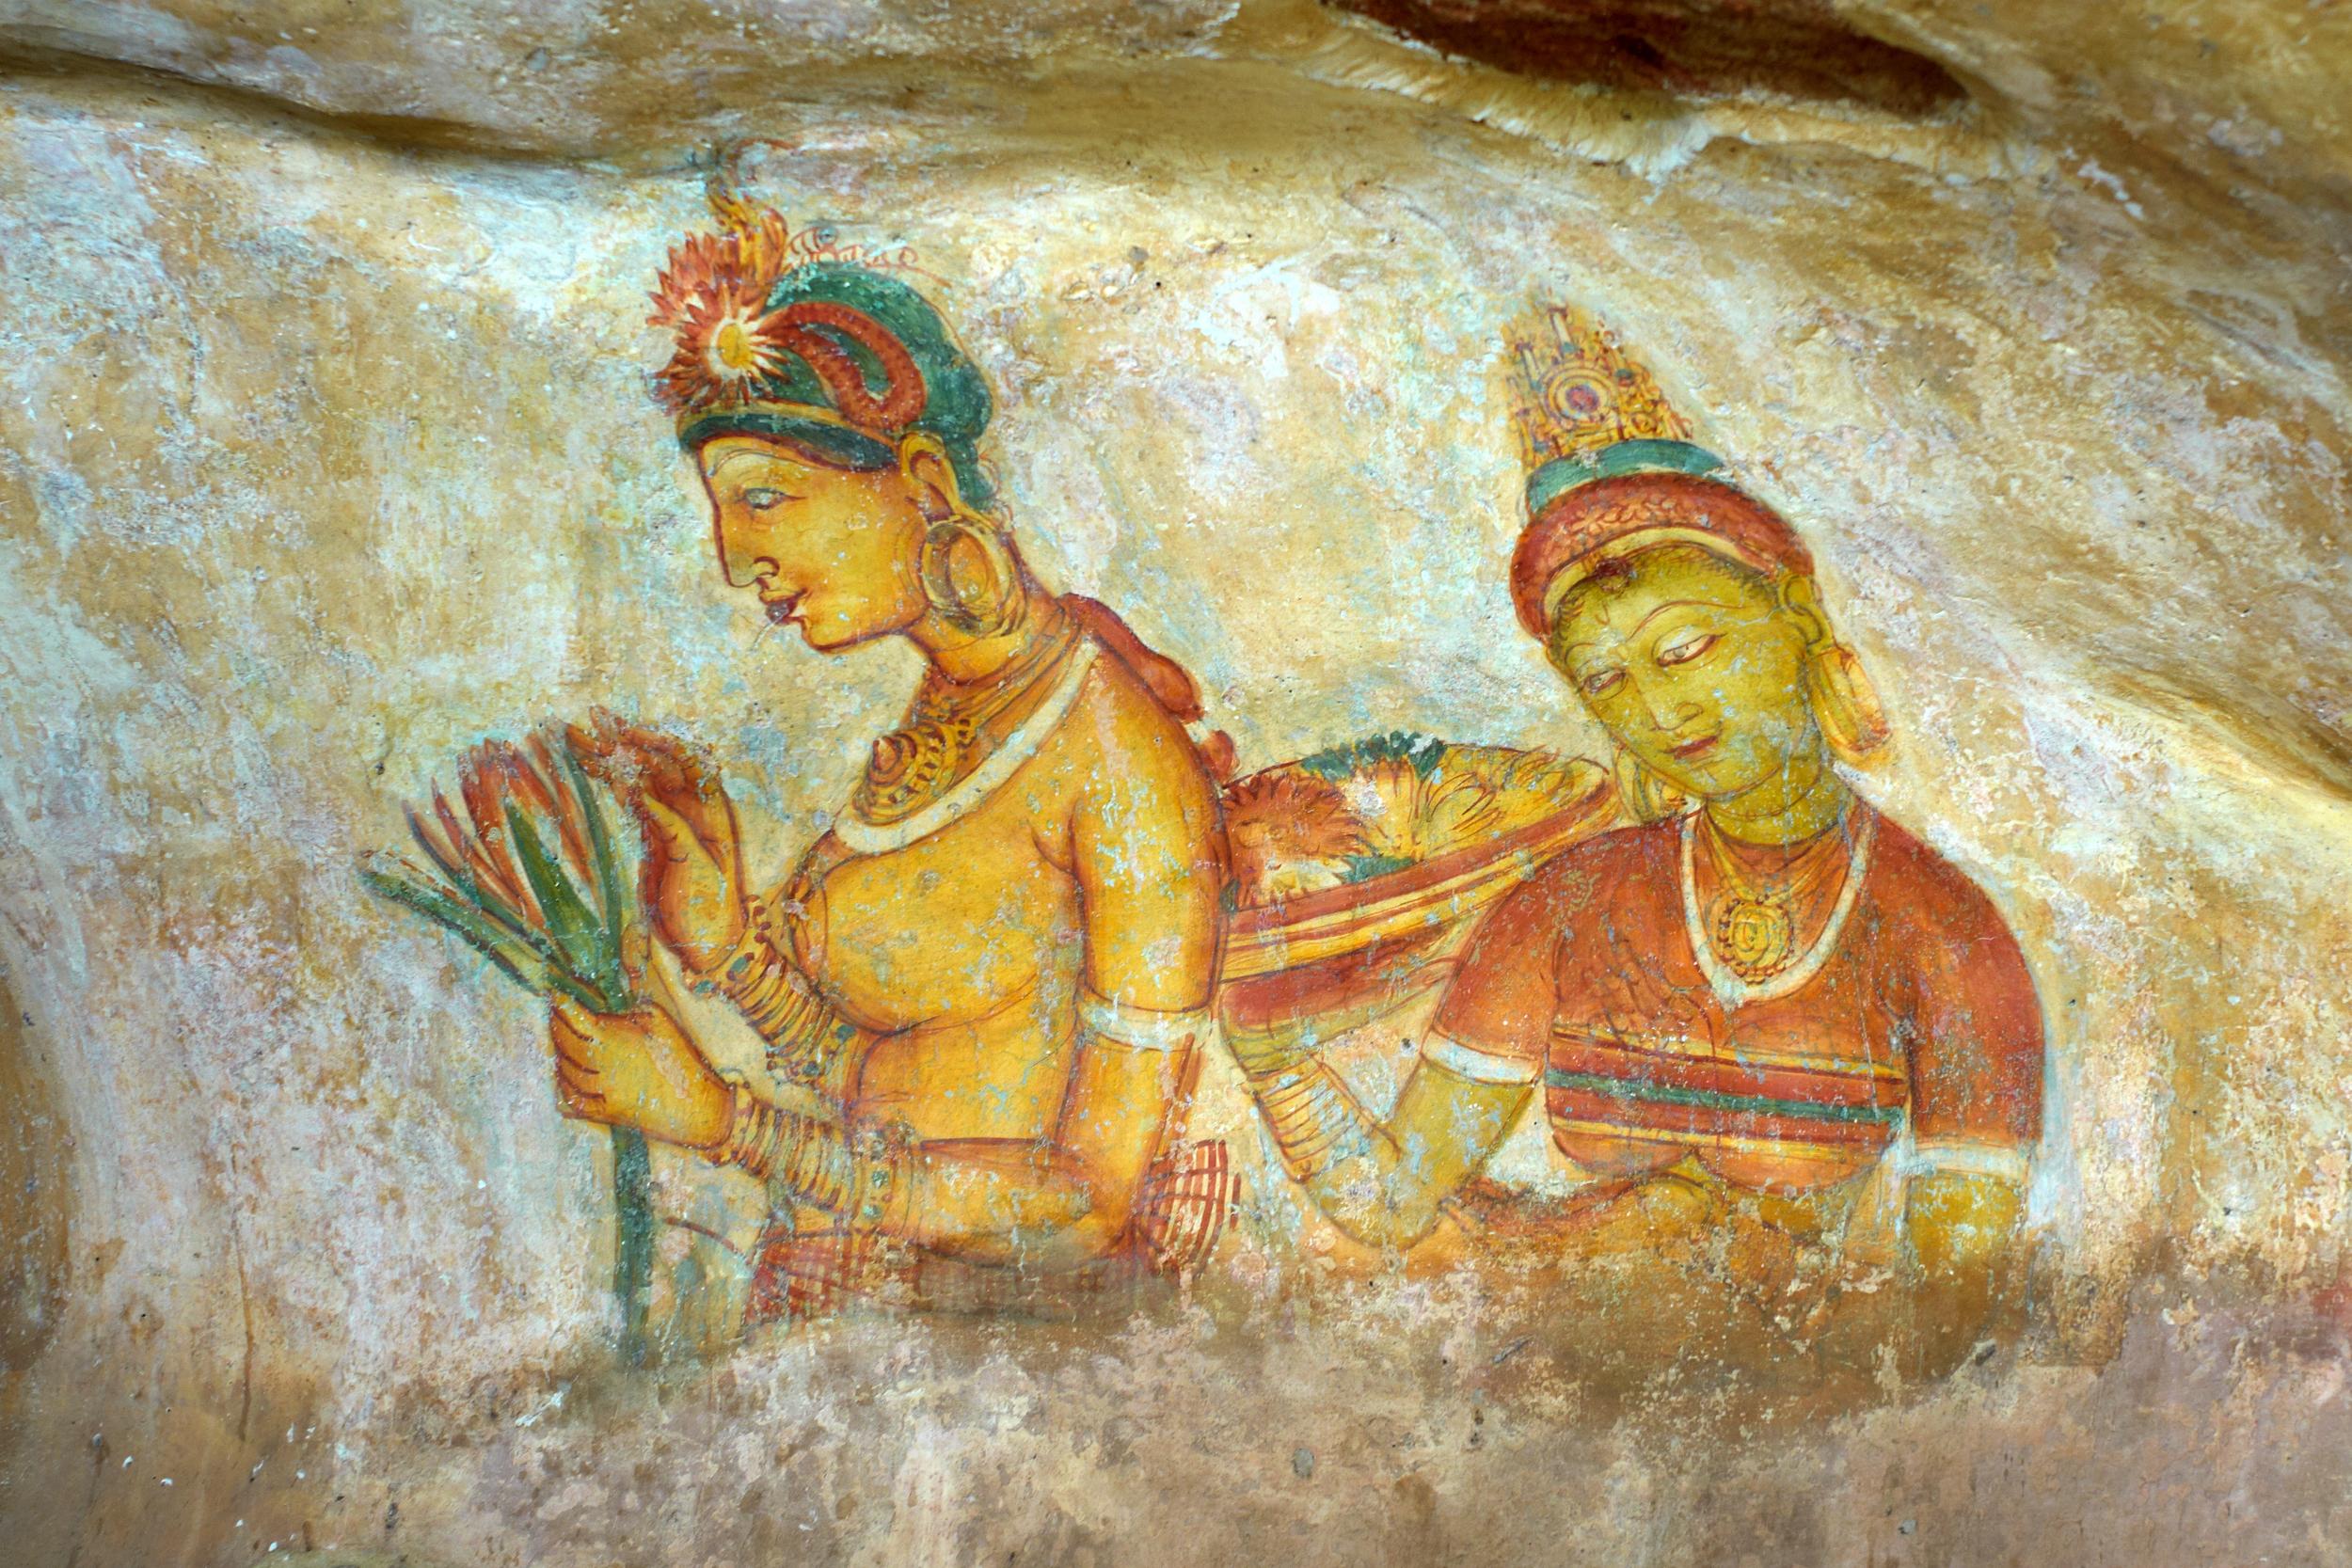 invite-to-paradise-sri-lanka-holiday-honeymoon-sigiriya-rock-fortress-fresco-ancient-cave-paintings-2.jpg